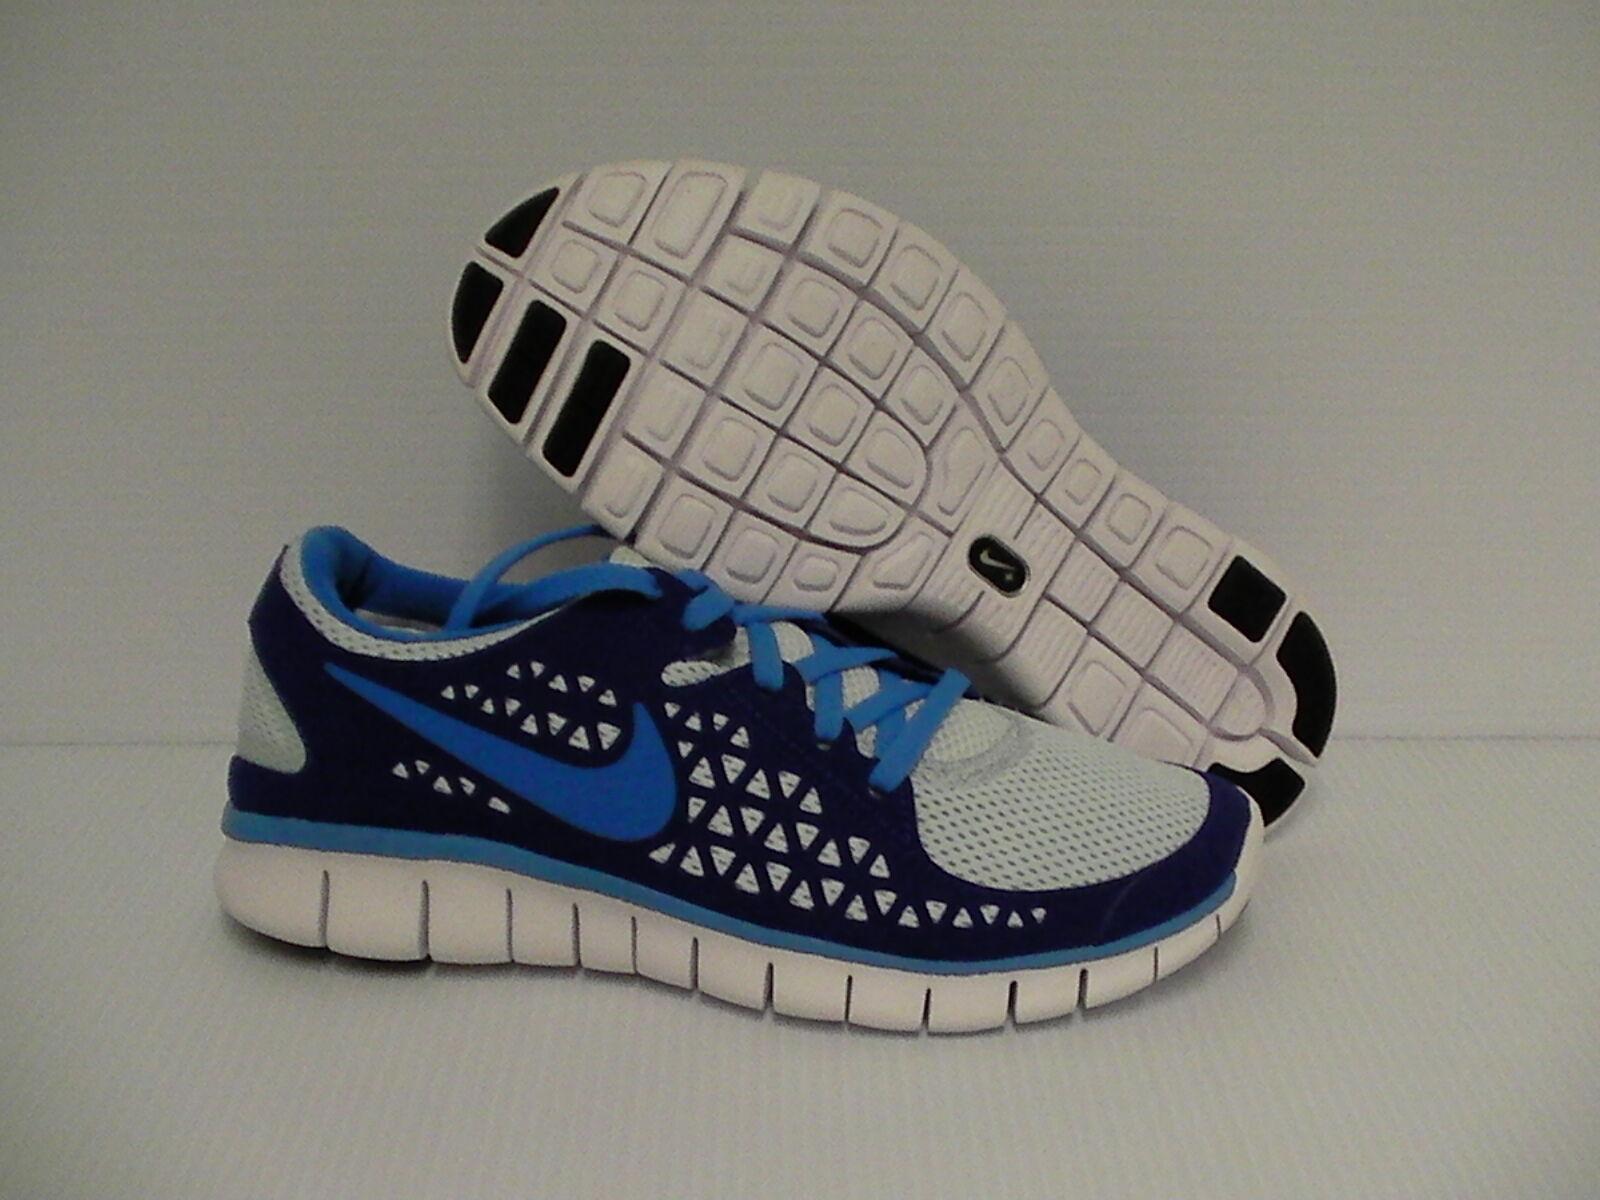 Damen Nike Free Run Laufschuhe Größe 8,5 8,5 8,5 Us 22d859